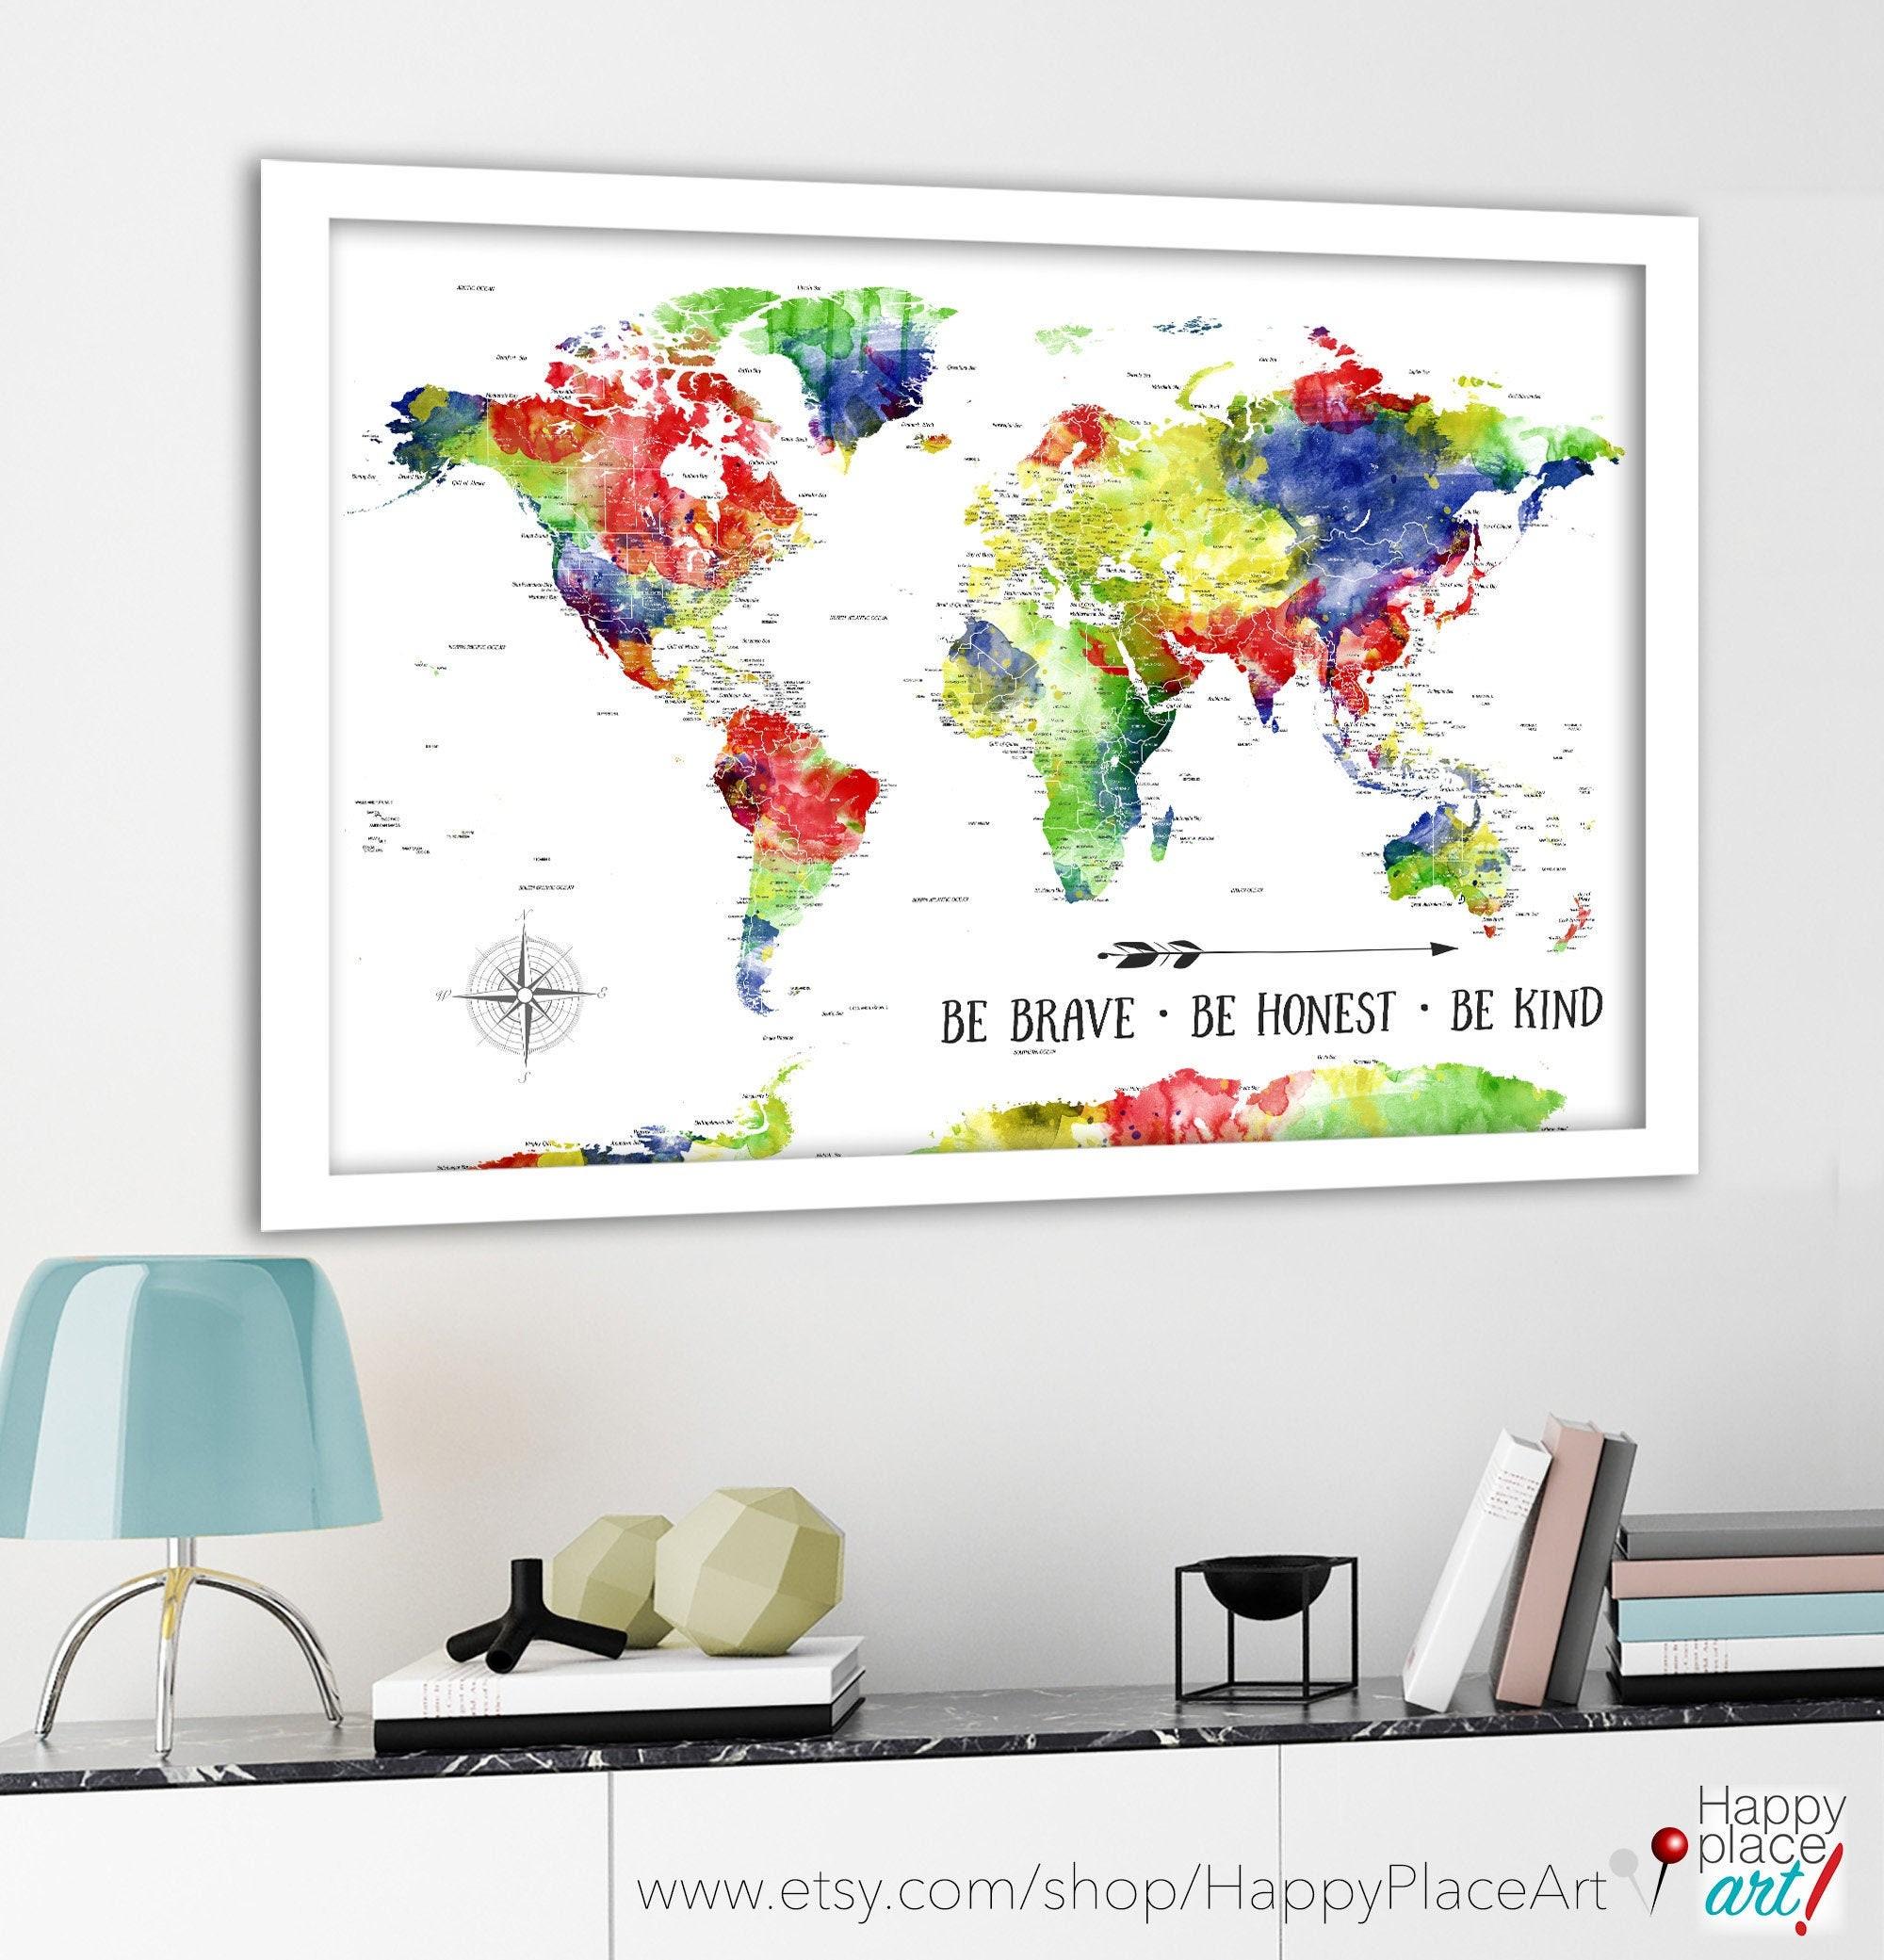 Honeymoon Map Framed Watercolor Map Bahrain Watercolor Map Framed ...